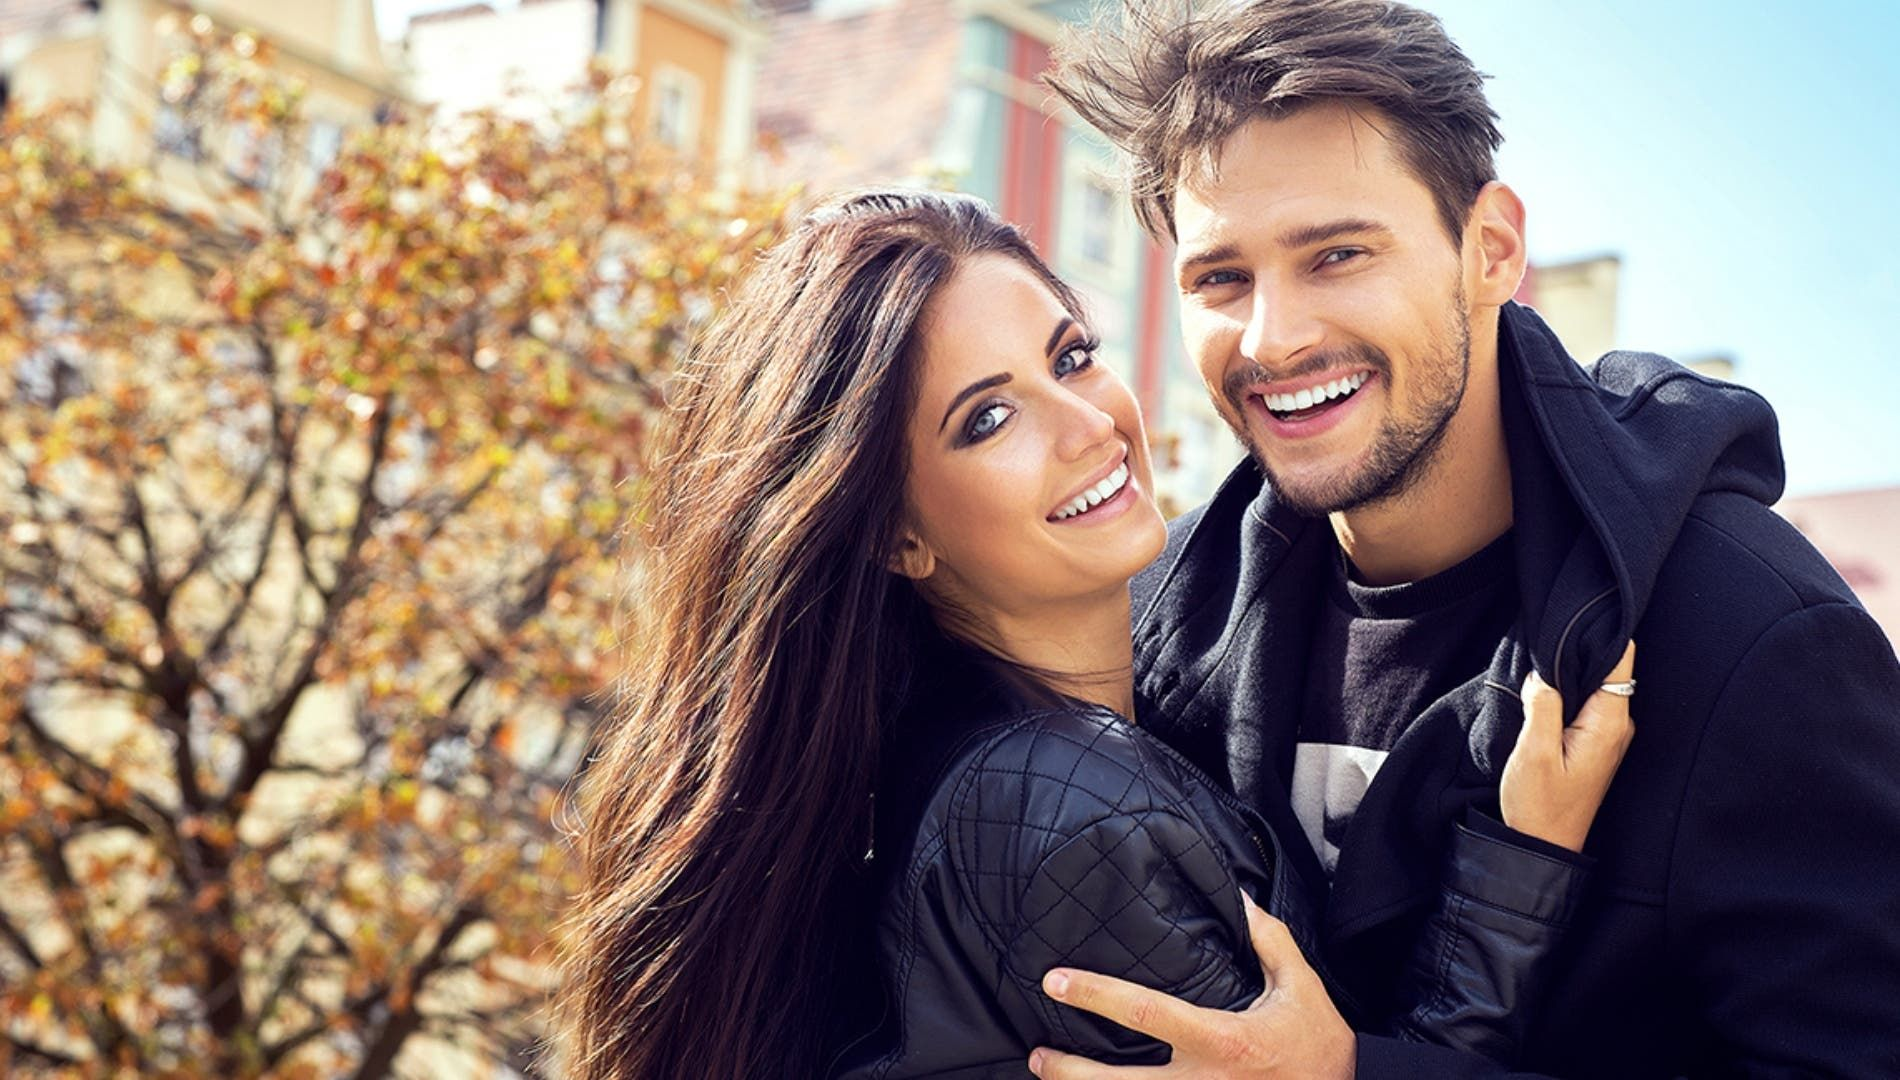 علامات إخلاص الزوج لزوجته Preparing For Marriage Happy Marriage Marriage